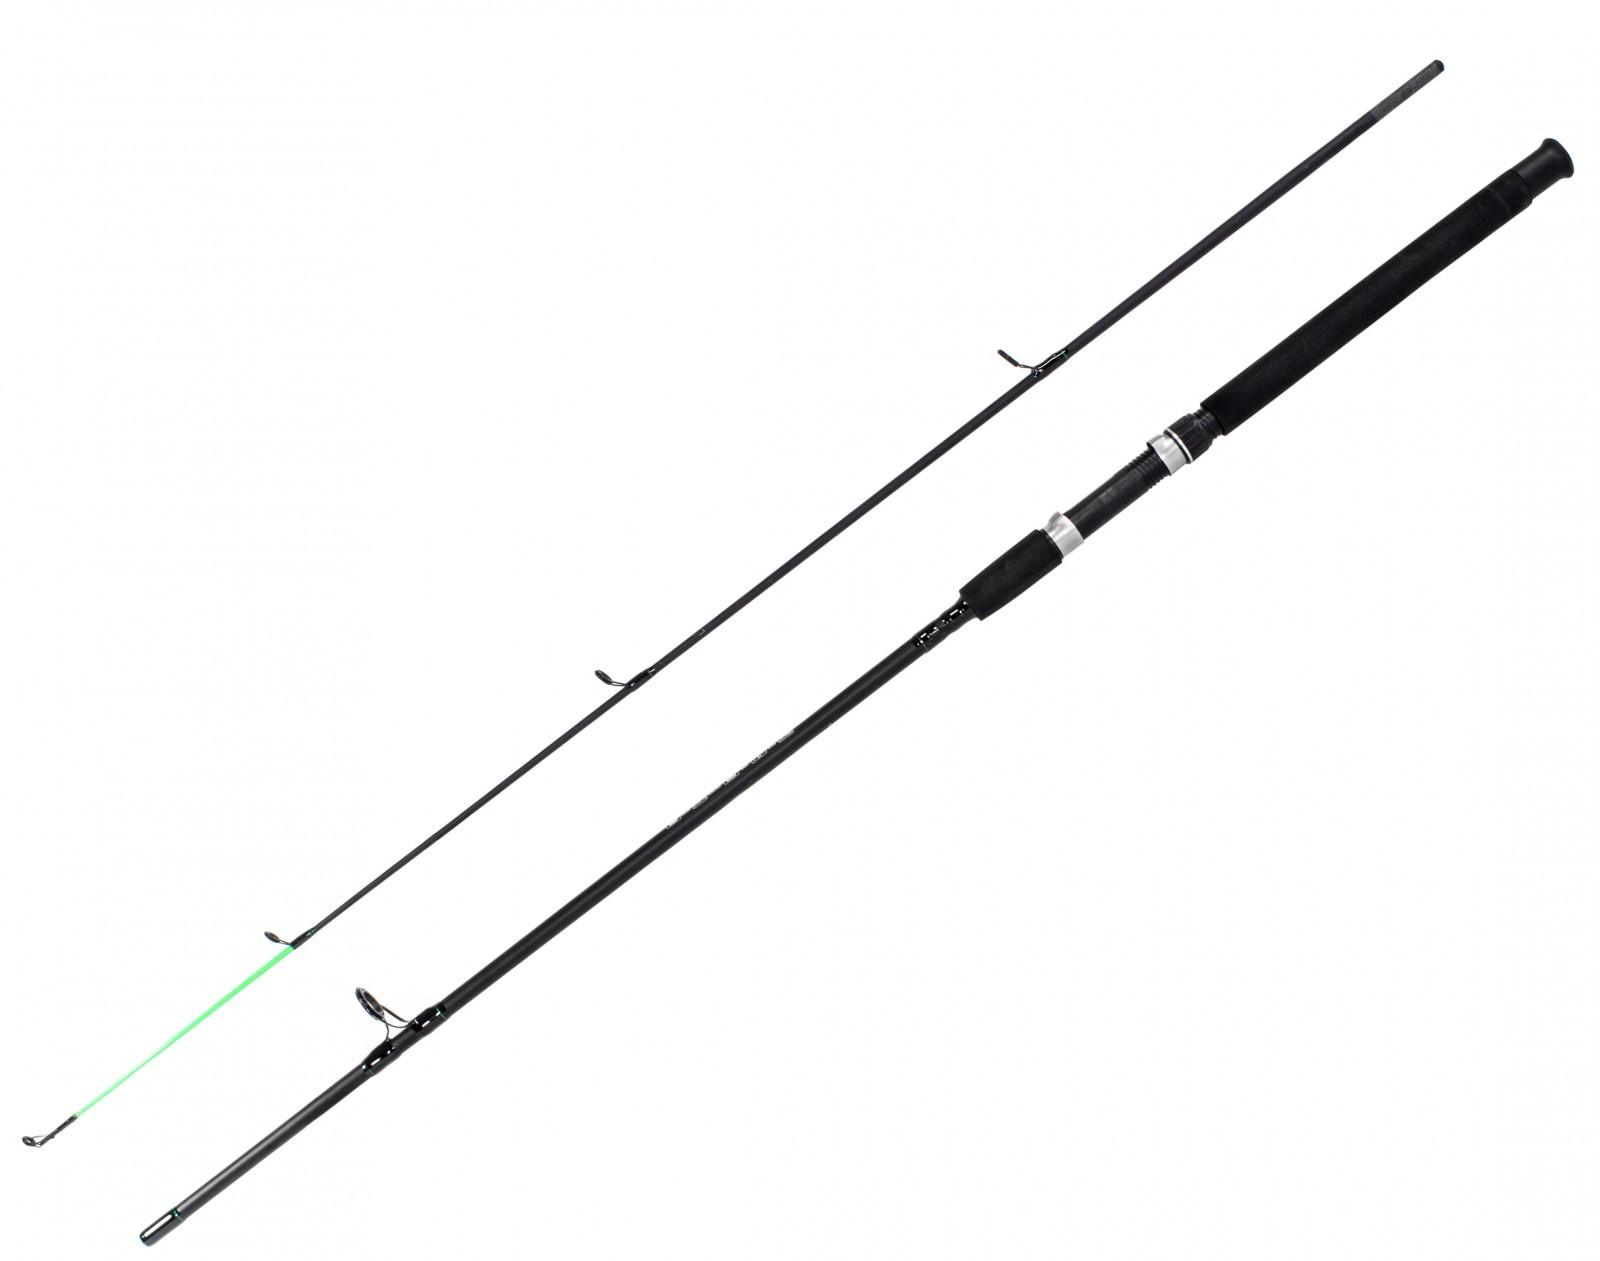 Cпиннинг штек. Mifine Assault 2.7 м / 10-40г / арт 1106-270